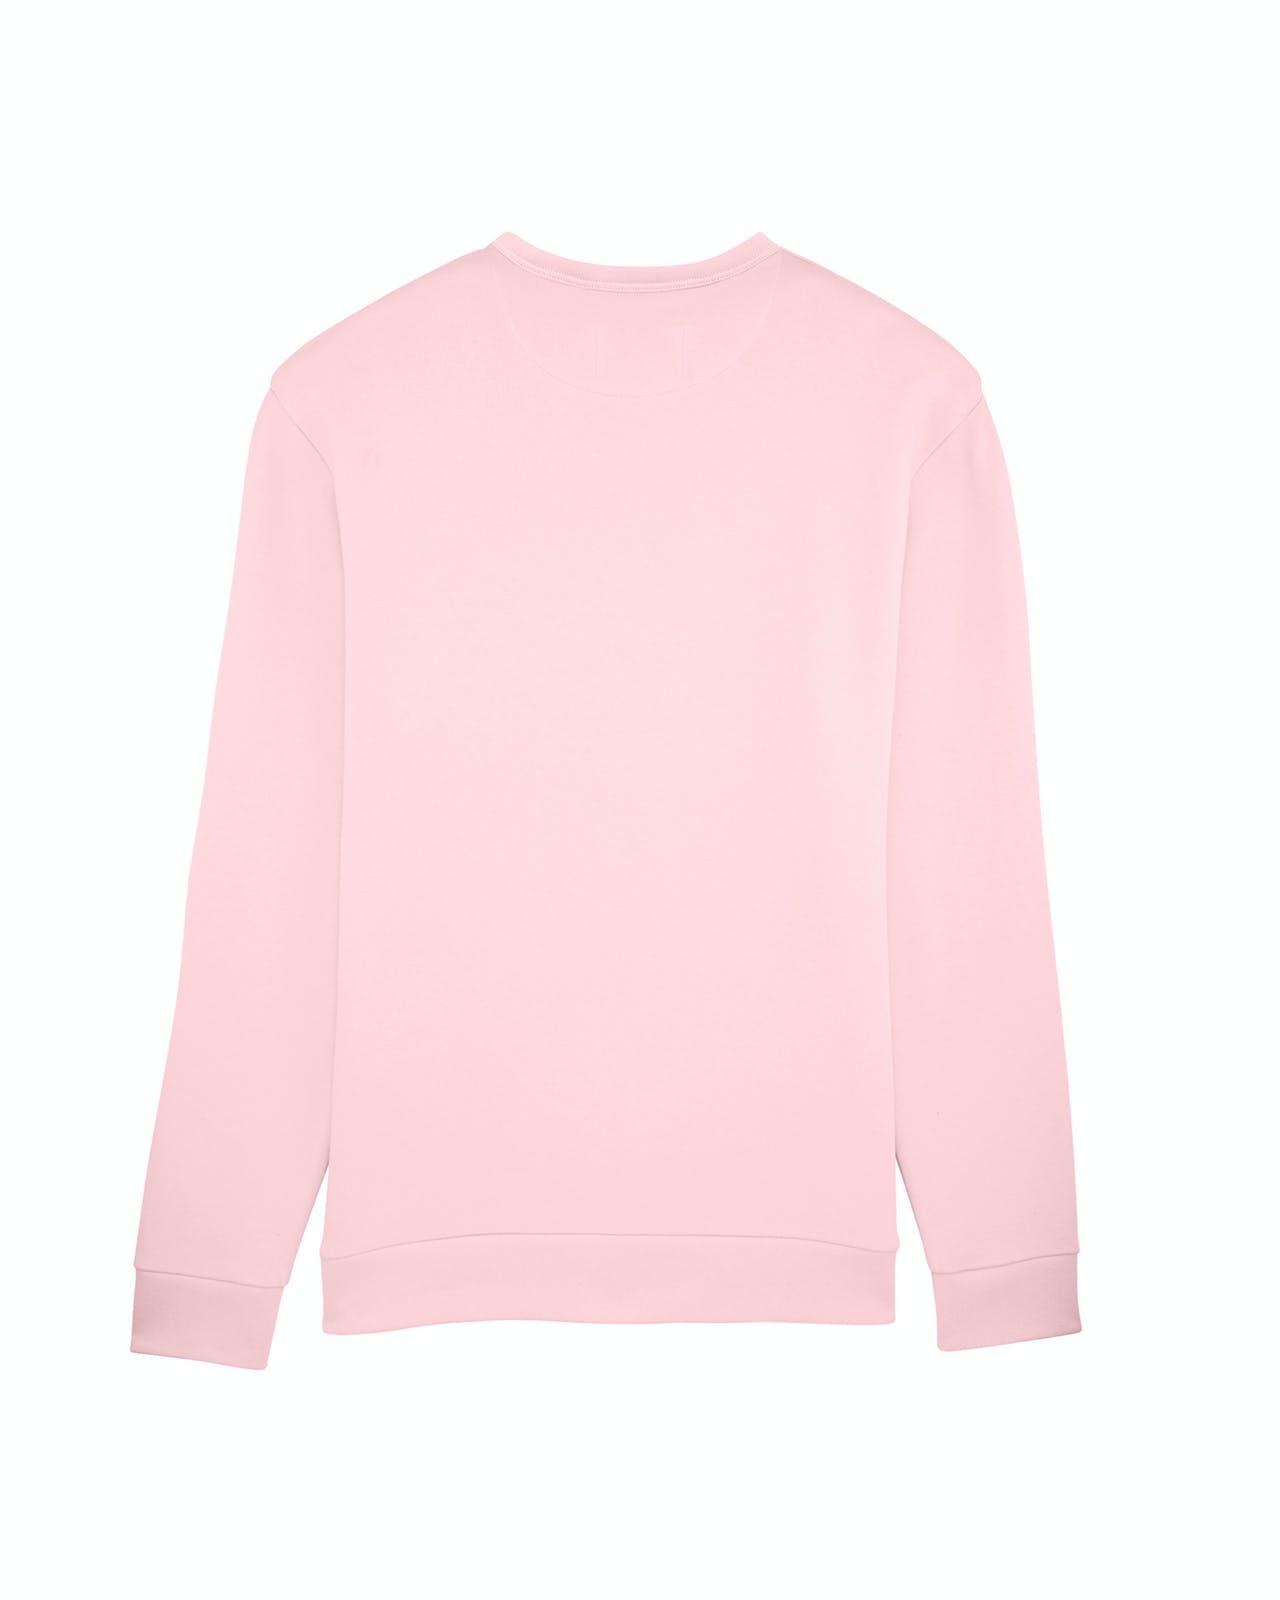 Goat Organic Apparel Ace pink